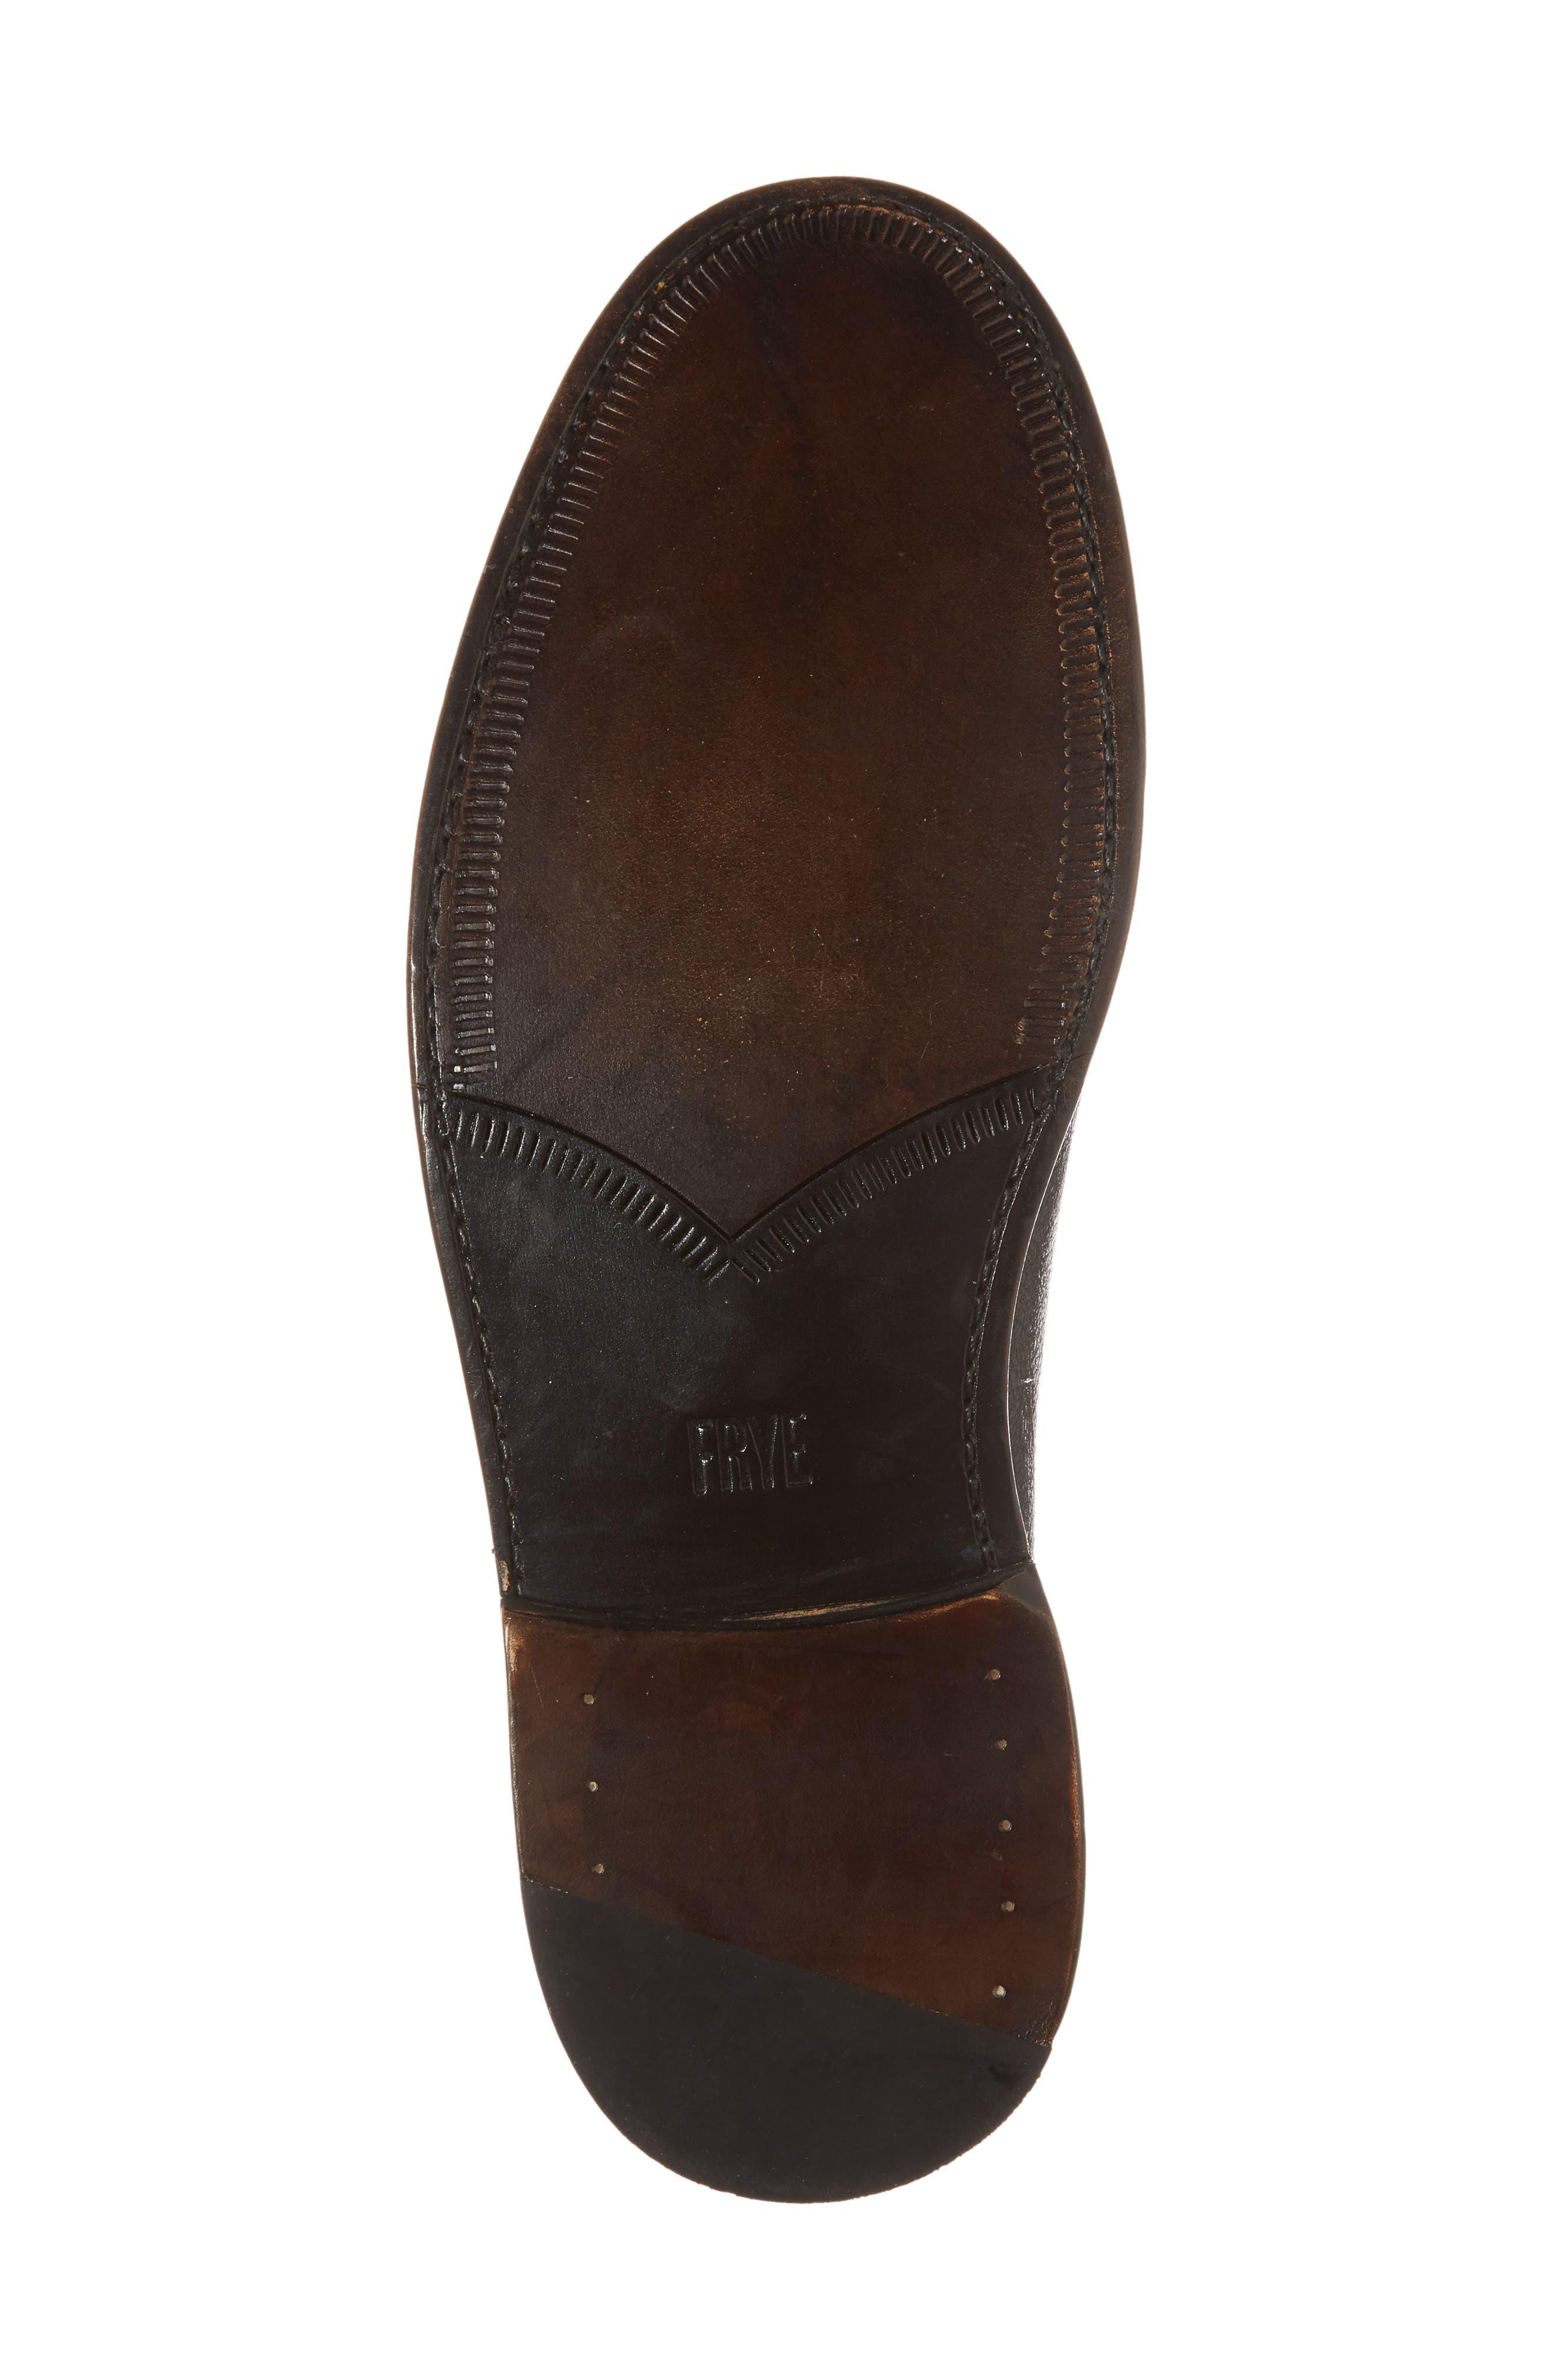 Jones Plain Toe Derby,                             Alternate thumbnail 6, color,                             Dark Brown Leather